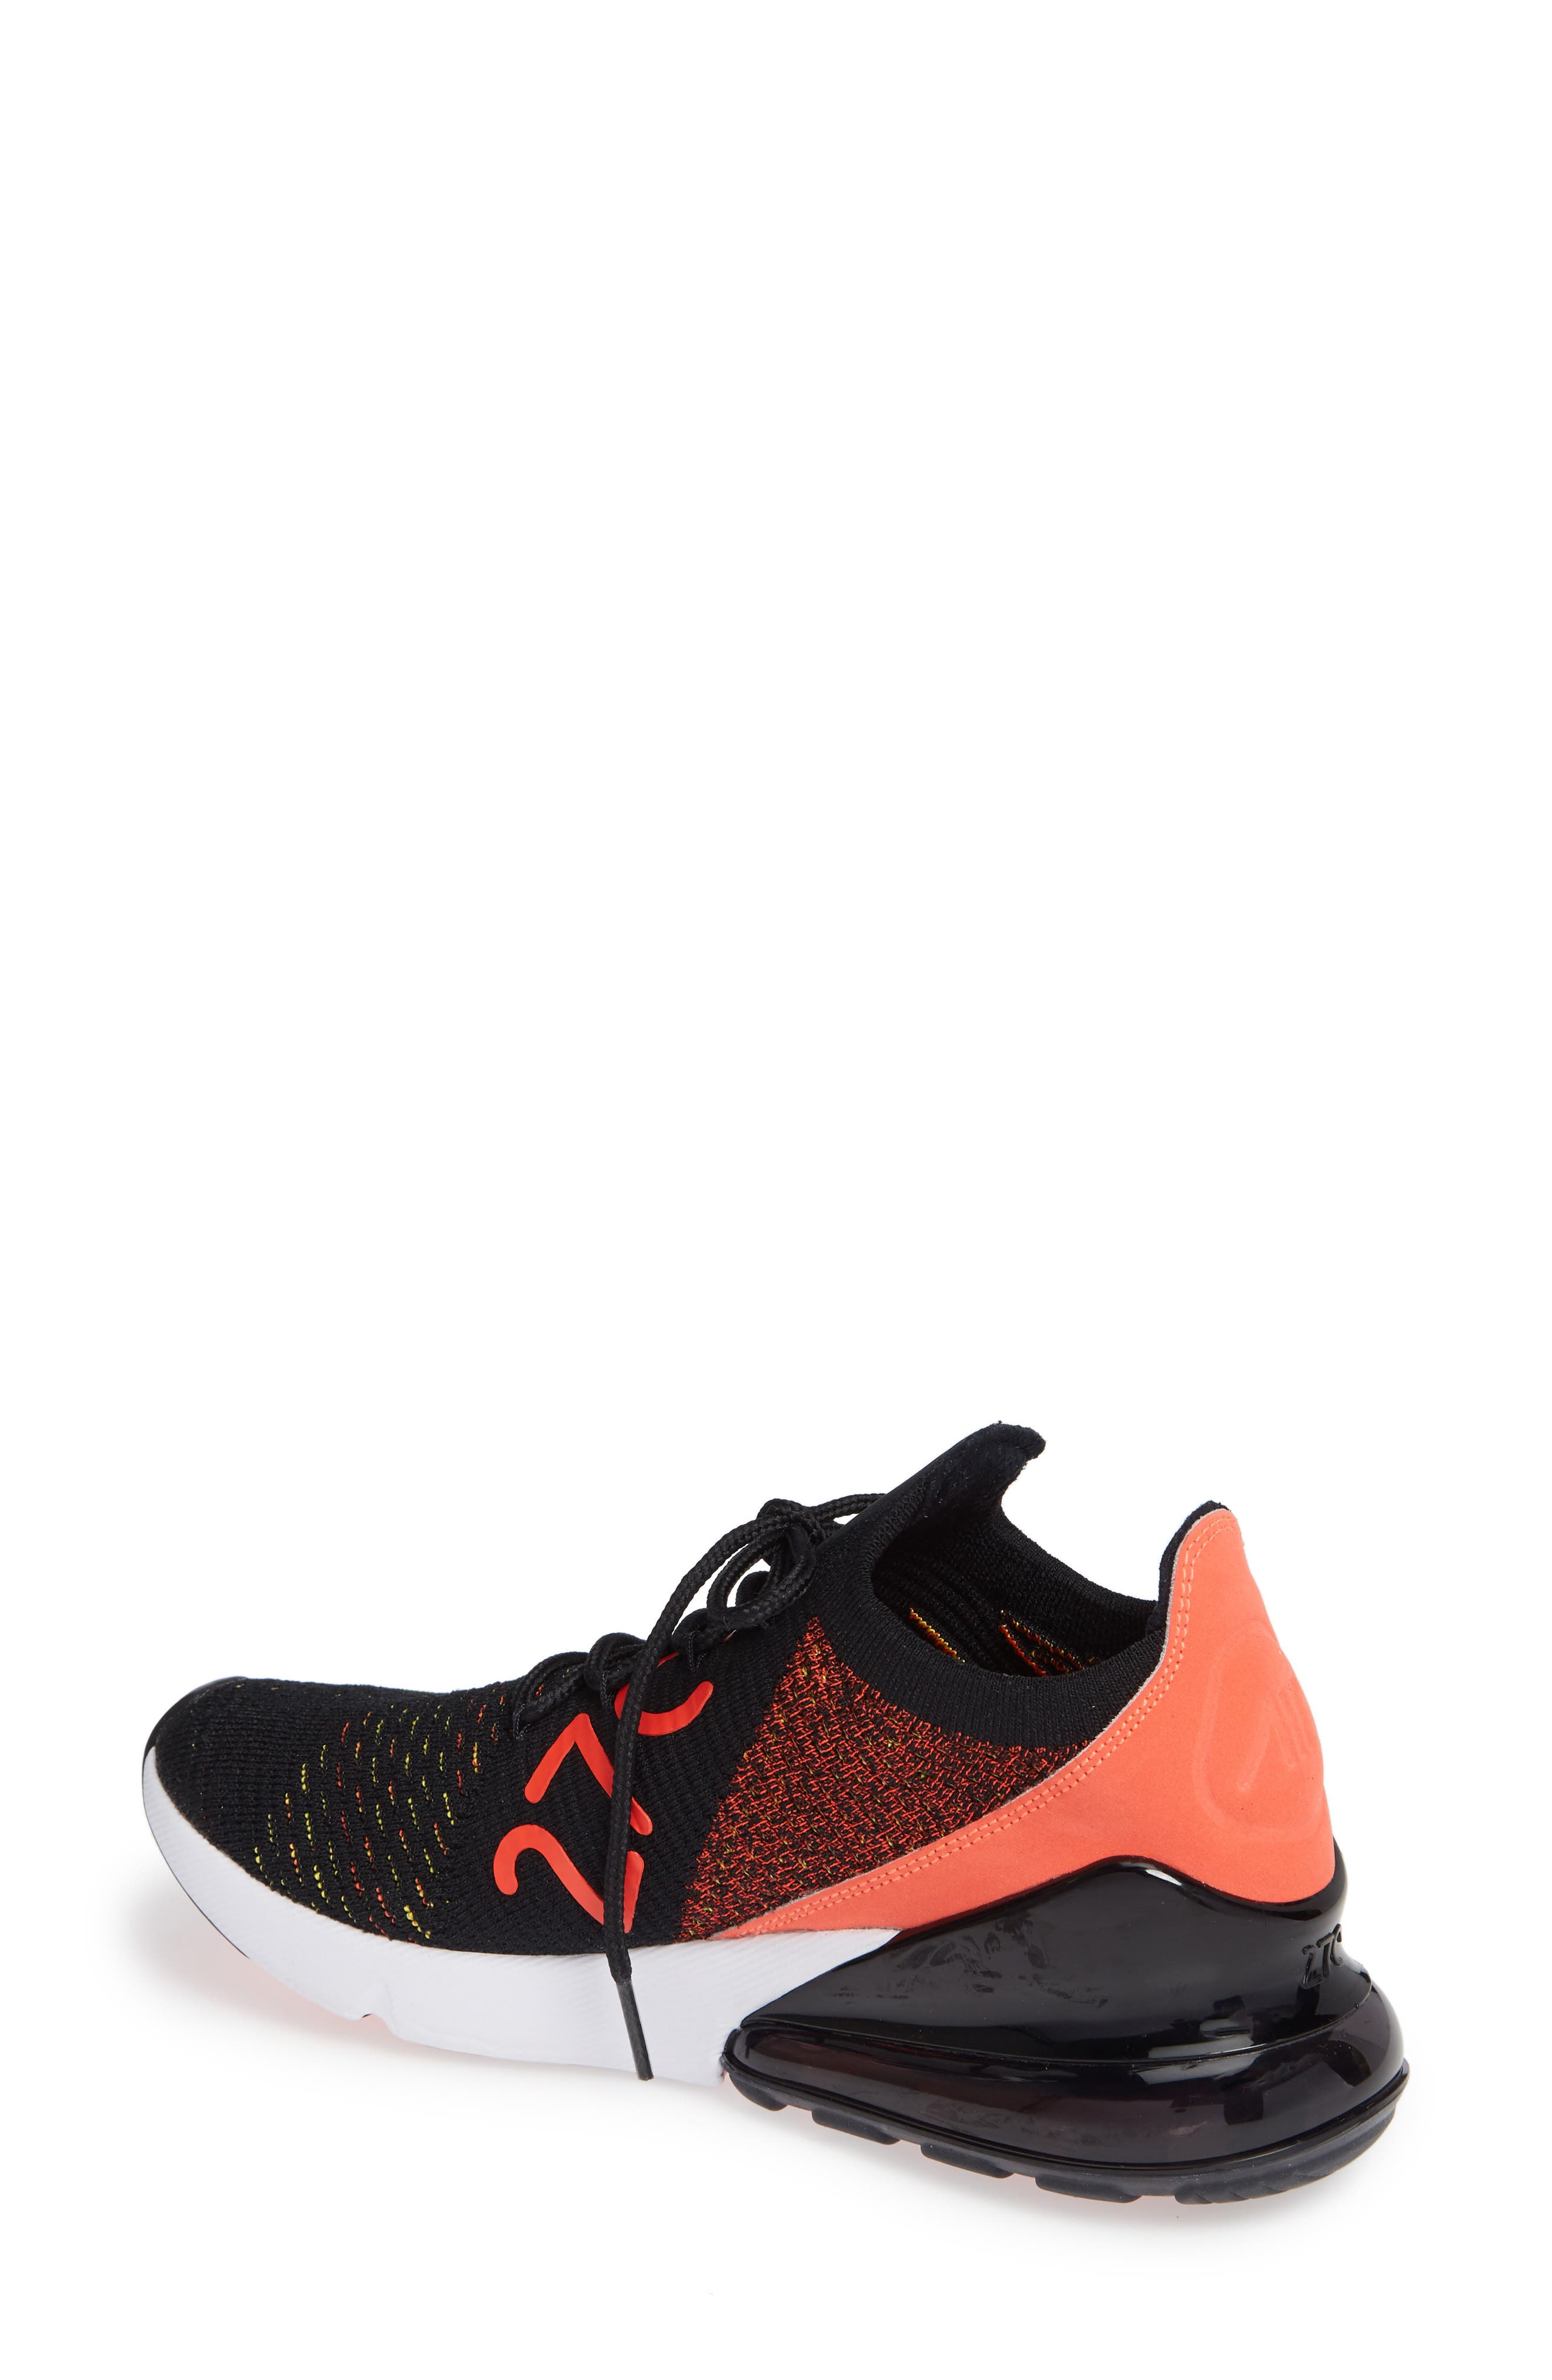 Air Max 270 Flyknit Sneaker,                             Alternate thumbnail 2, color,                             BLACK/ YELLOW STRIKE/ CRIMSON